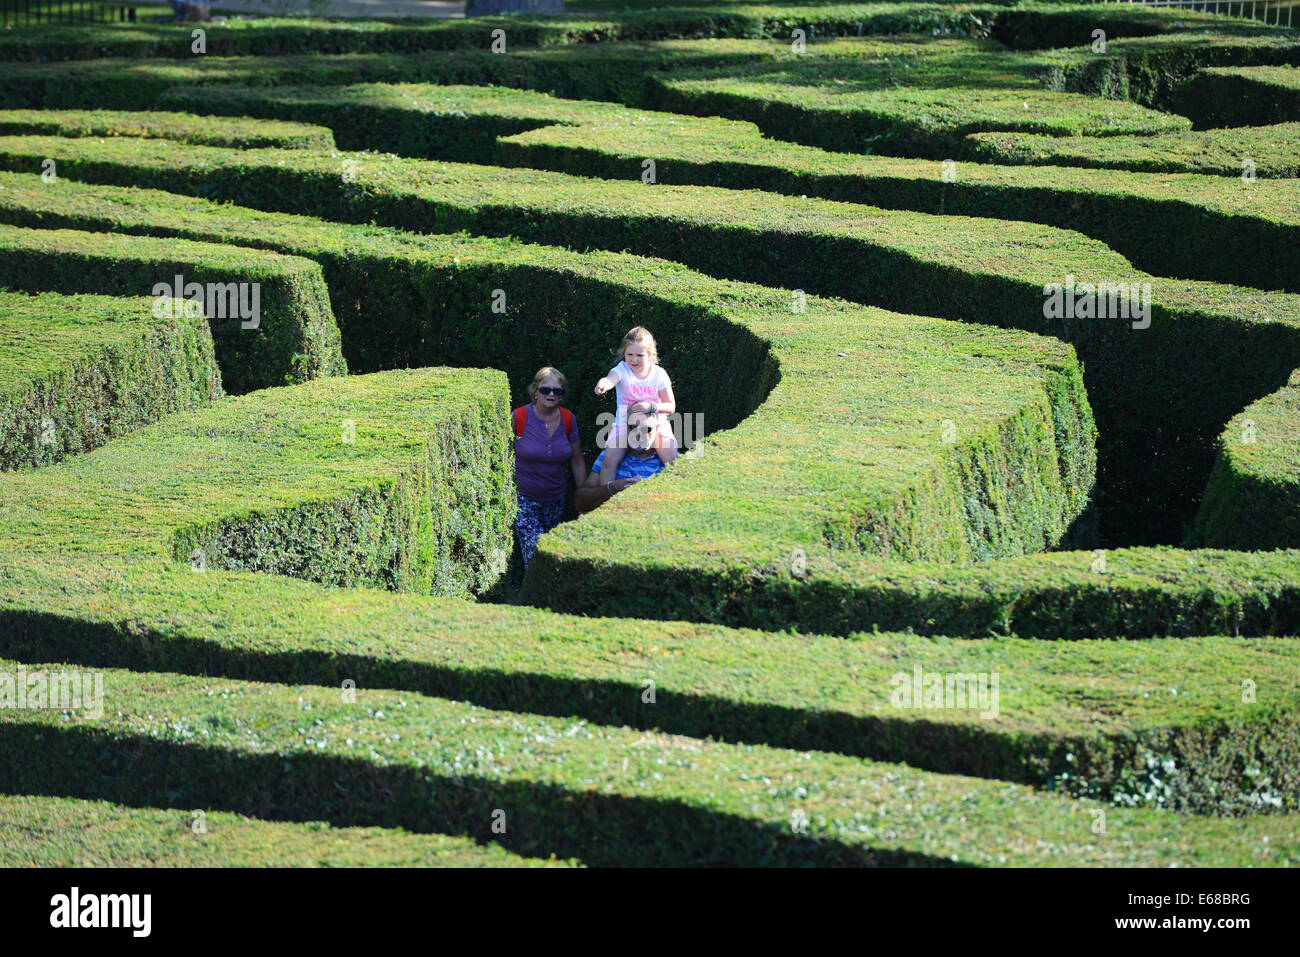 Longleat Safari Park hedge maze, Wiltshire, England - Stock Image